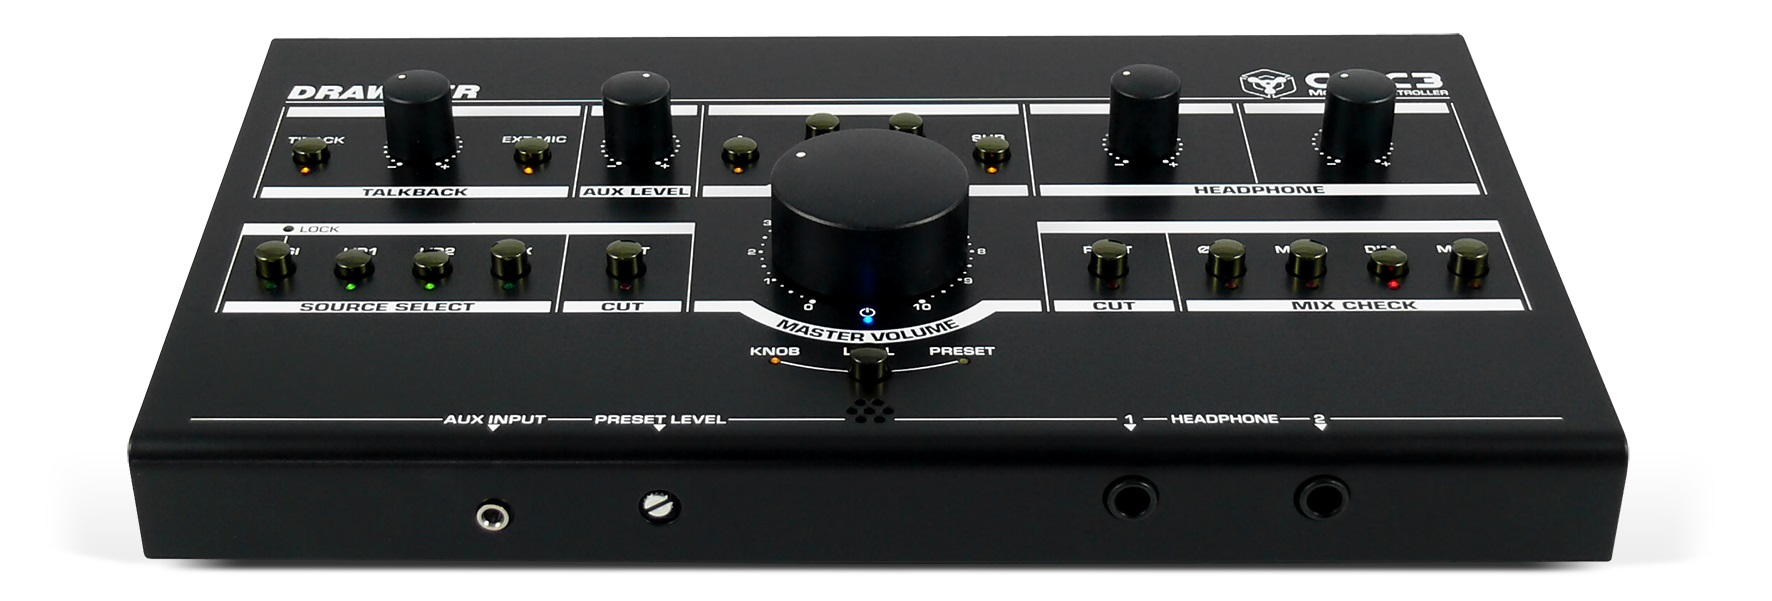 Drawmer Cmc3 Monitor Control